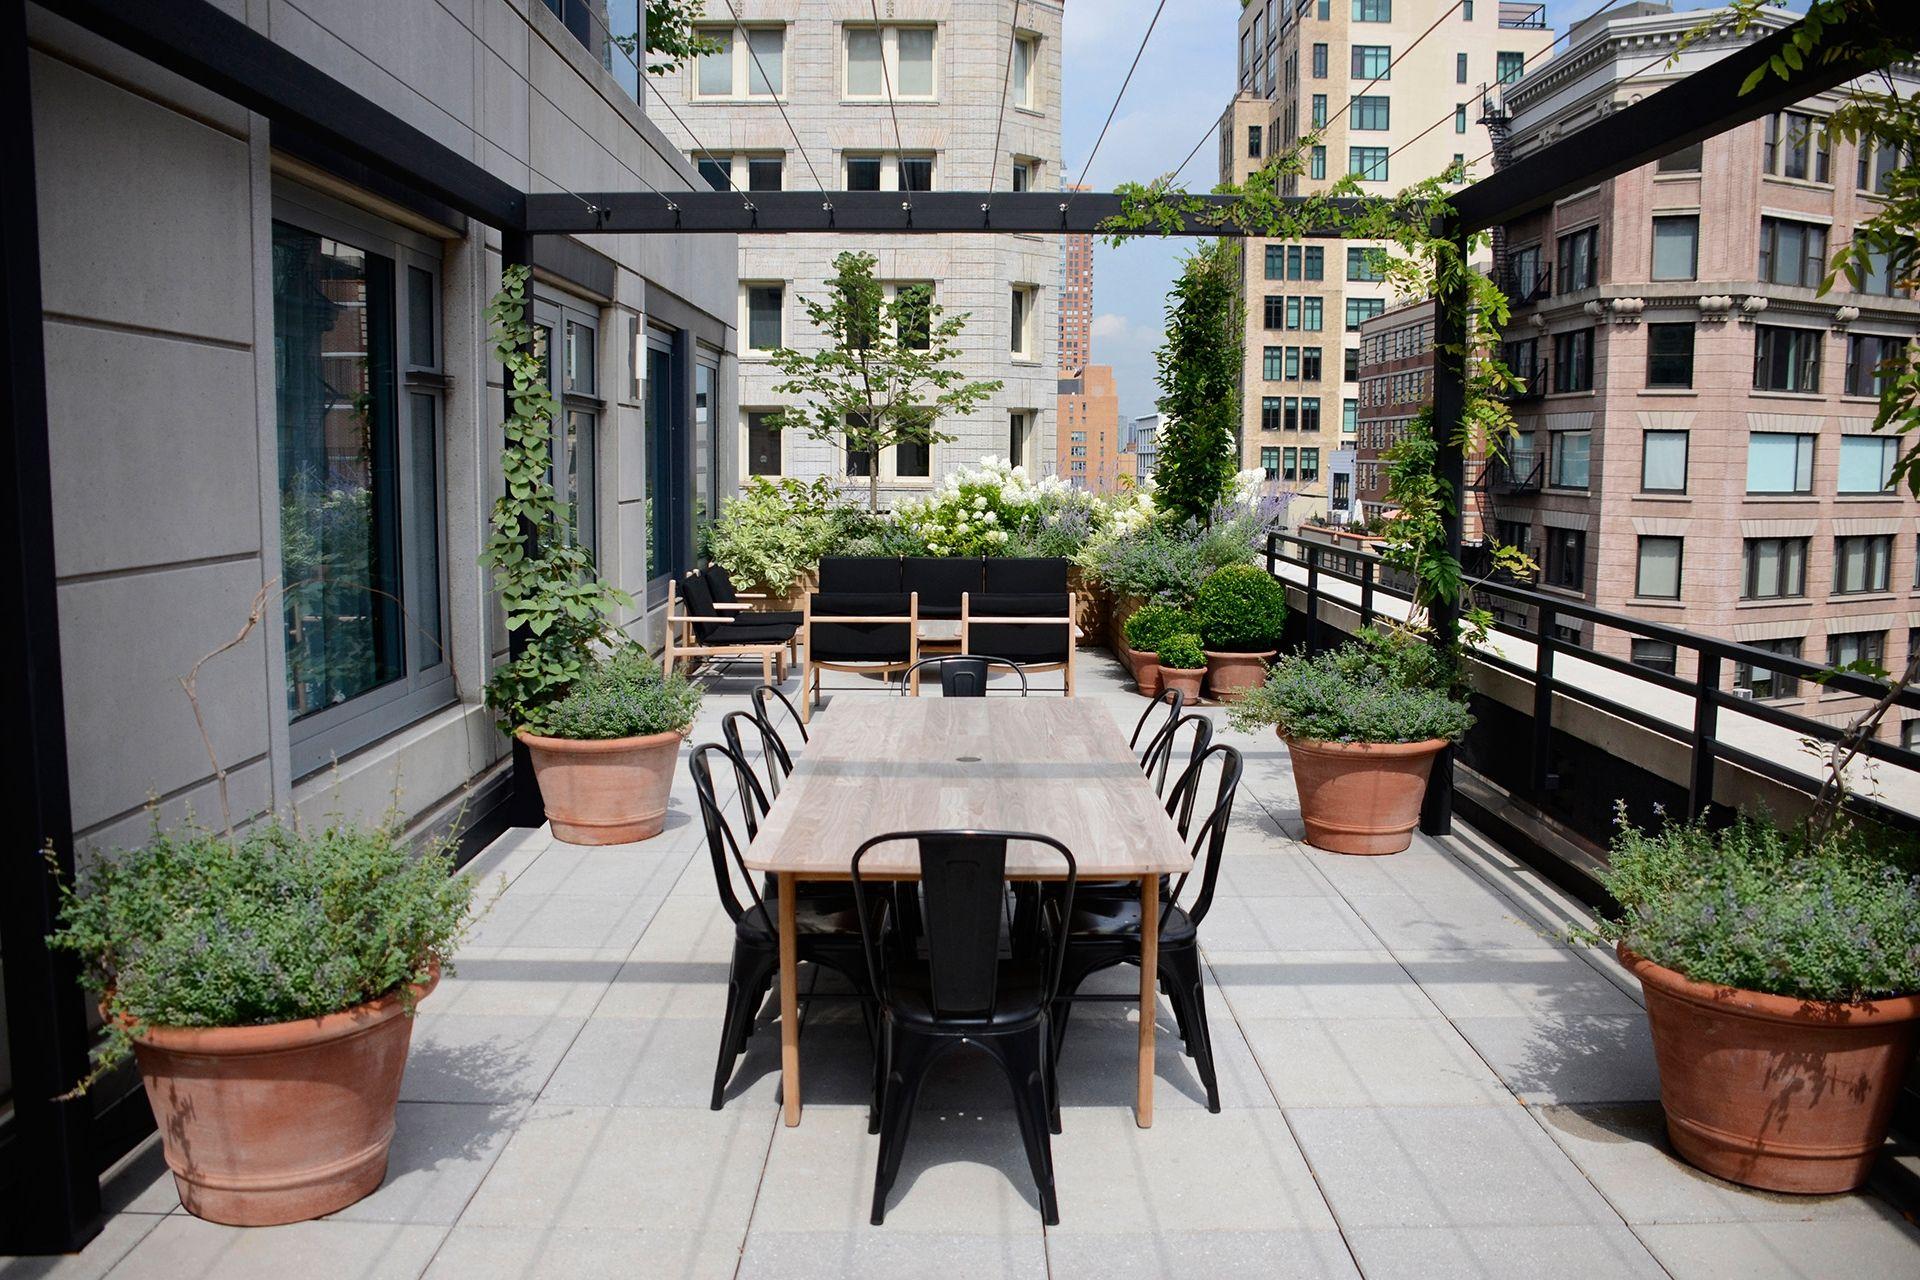 Smyth Hotel Tribeca City Terrace Rooftop Garden Design Harrison Green